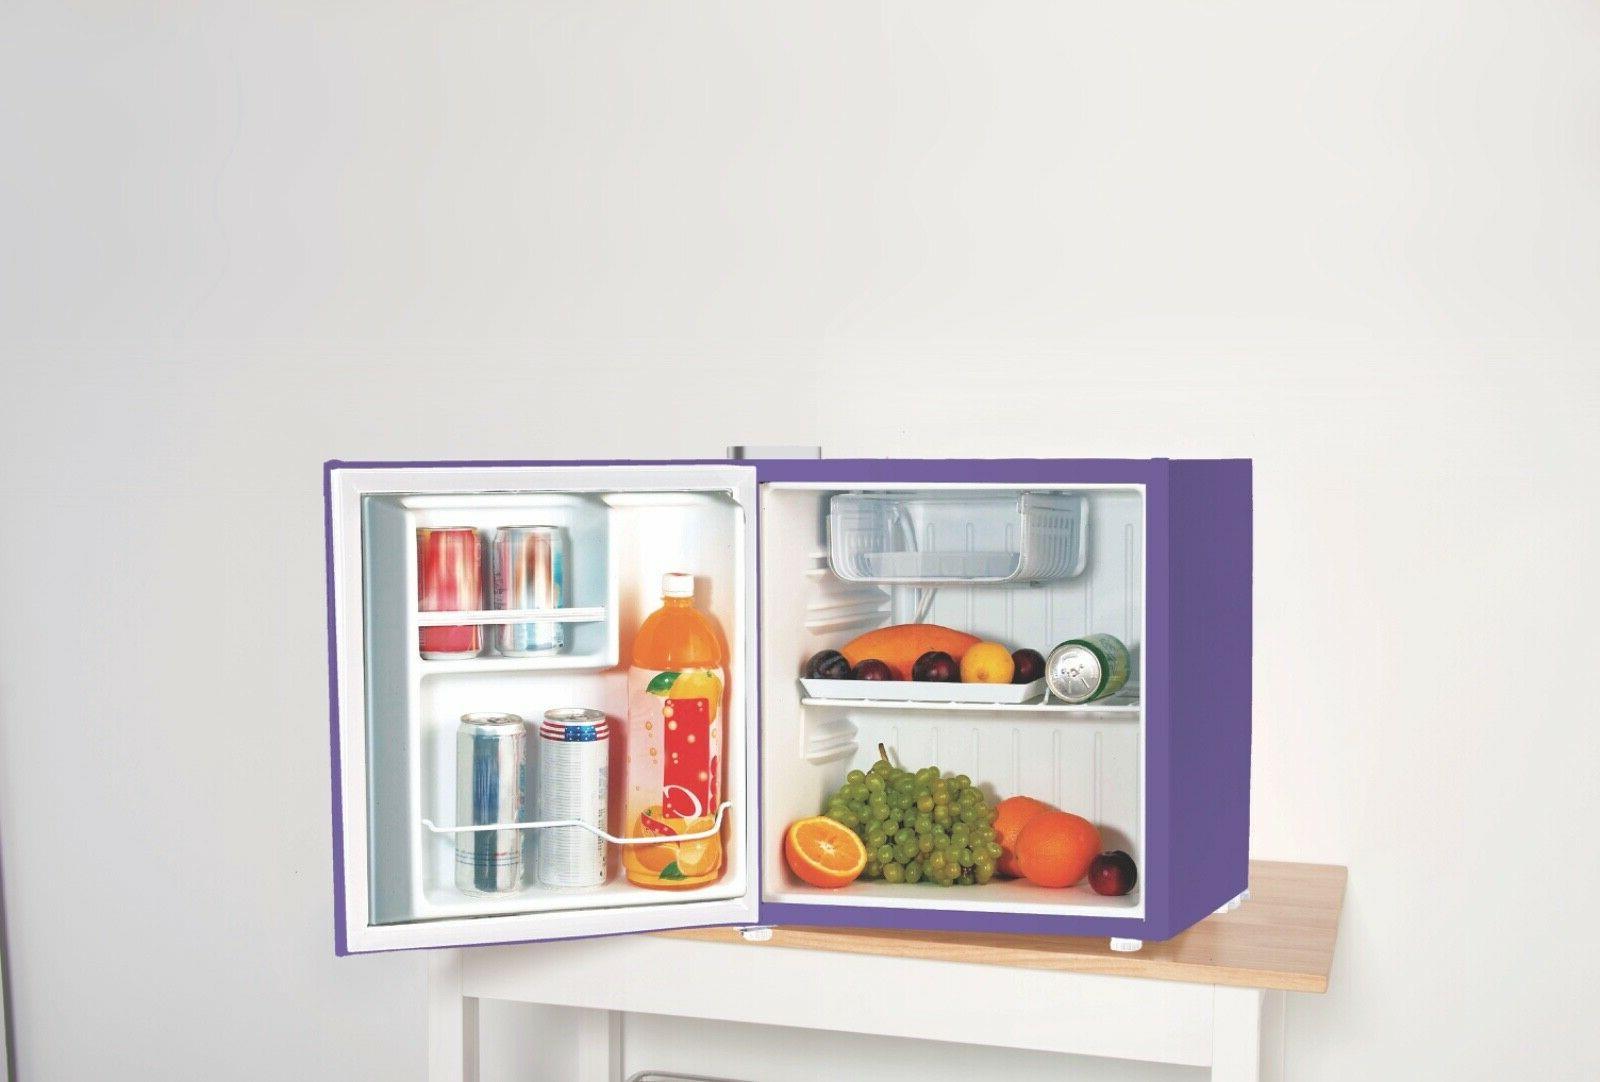 Mini Single 4 Refrigerator Compact Cooler